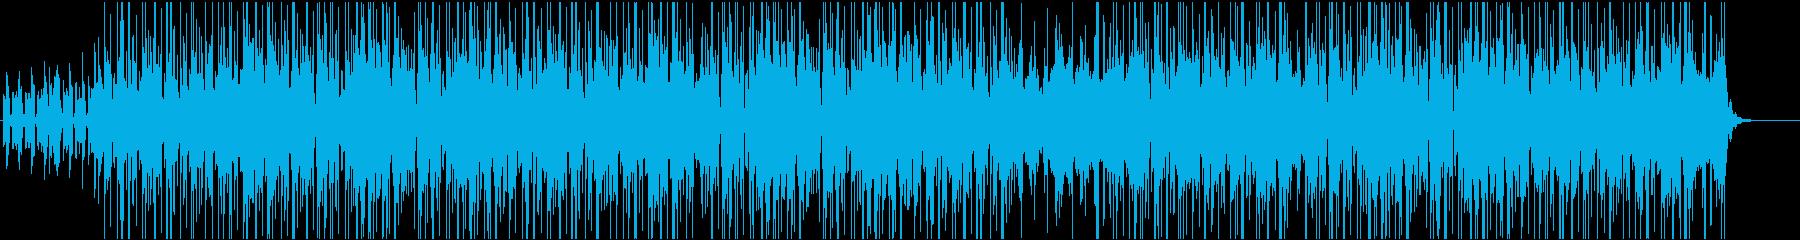 JazzyなインストヒップホップBGMの再生済みの波形